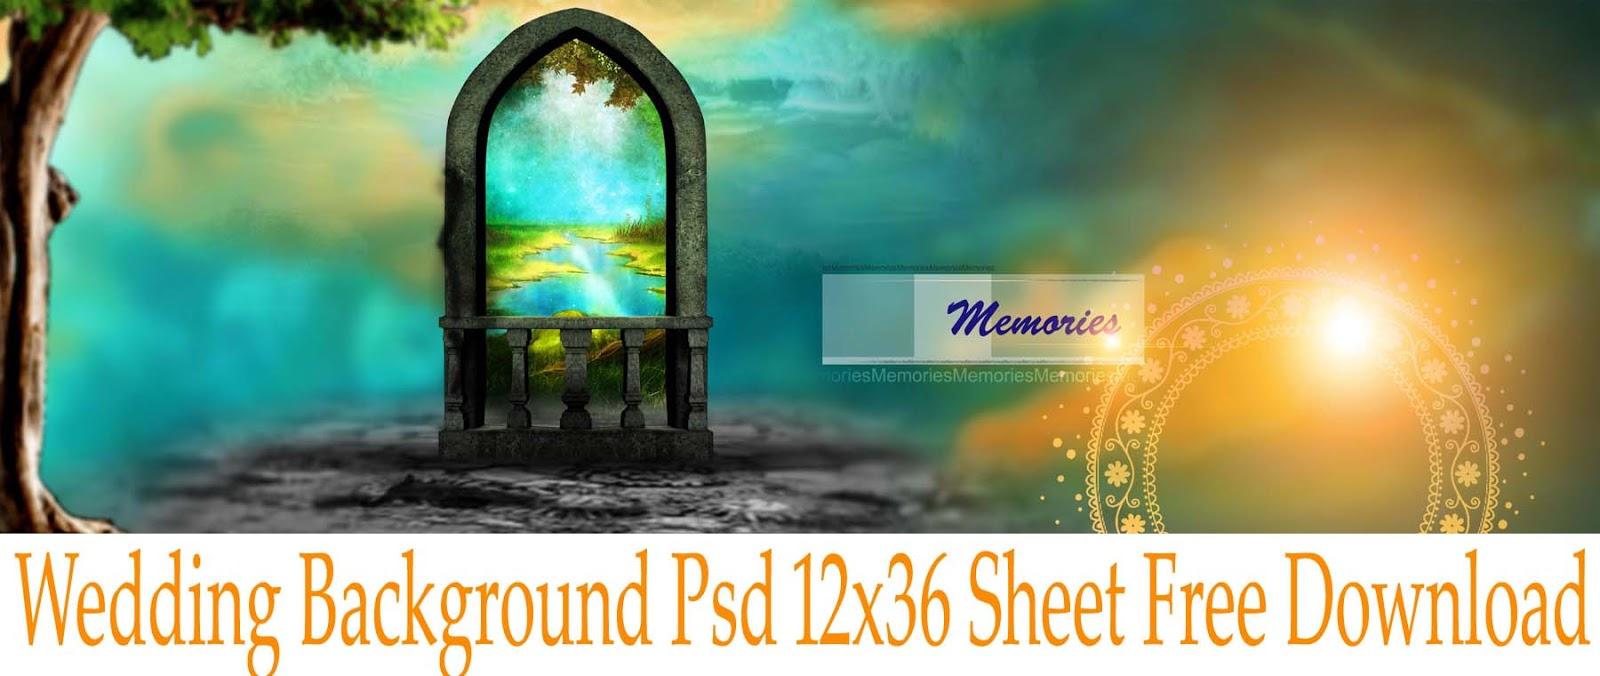 Wedding Background Psd 12x36 Sheet Free Download Luckystudio4u